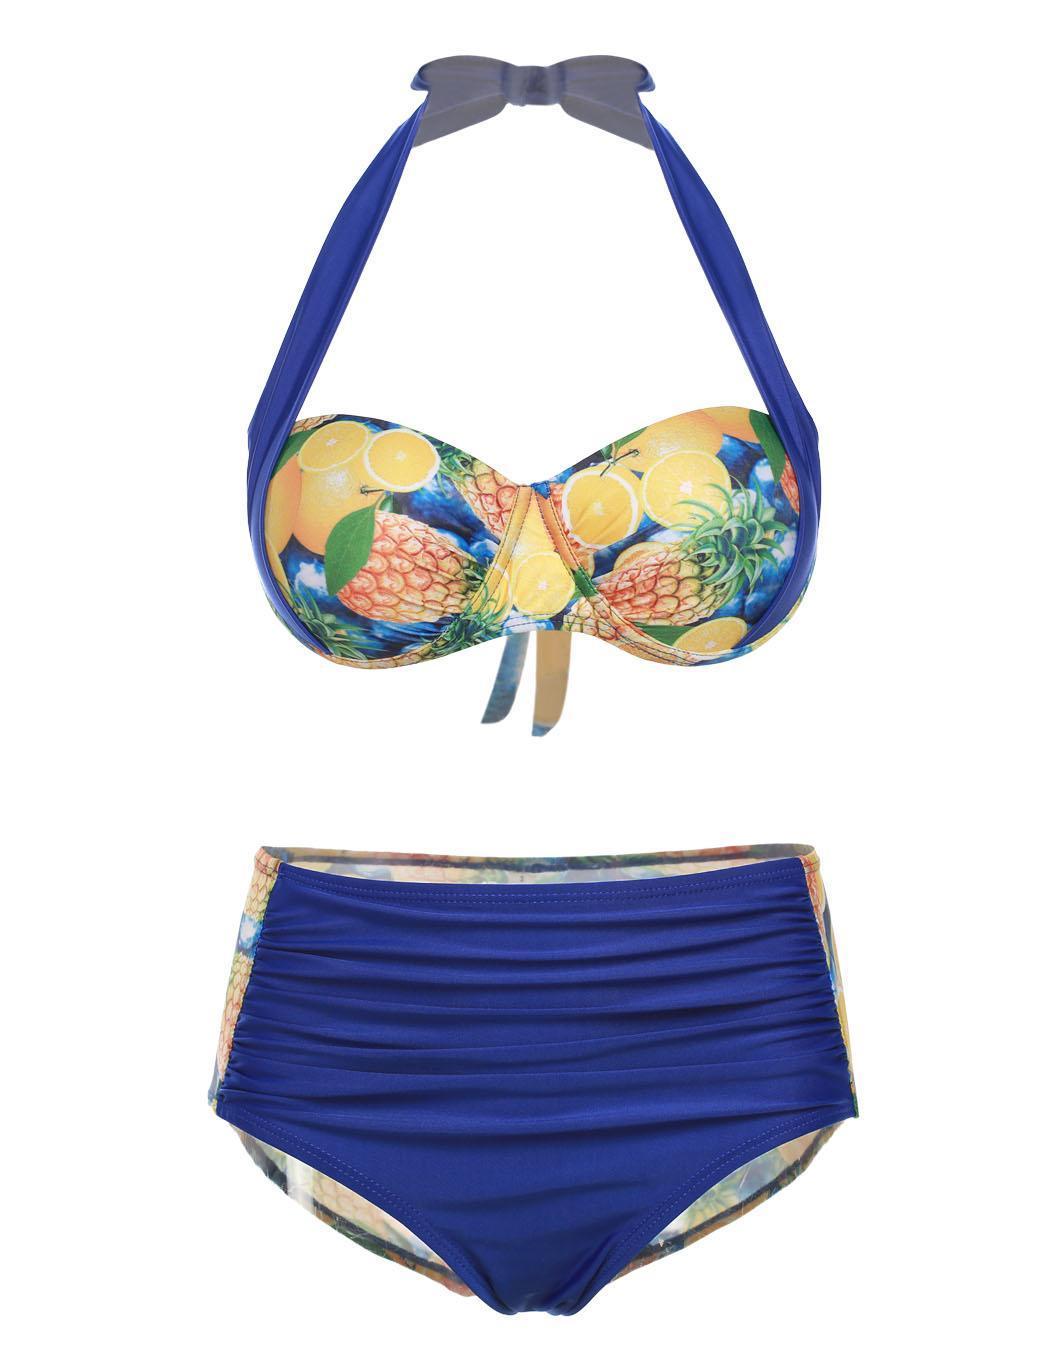 Donne sexy push up set bikini costume da bagno brasiliano - Donne grasse in costume da bagno ...